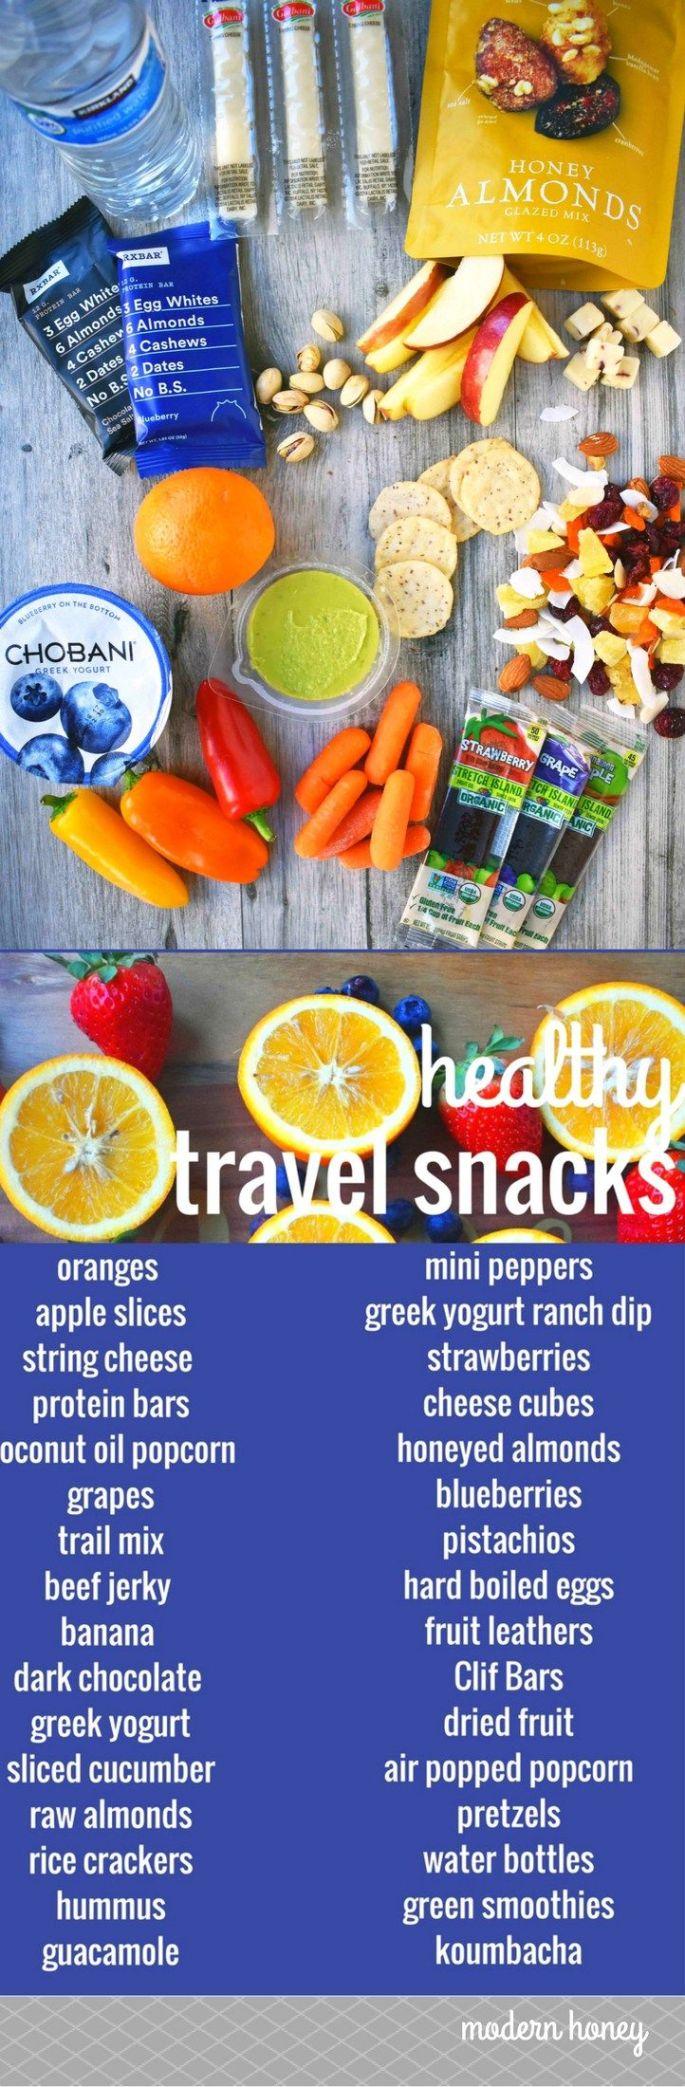 681b97d552c19aff7e782ca895d4bdfc--vegan-travel-snacks-healthy-road-trip-snacks-for-kids